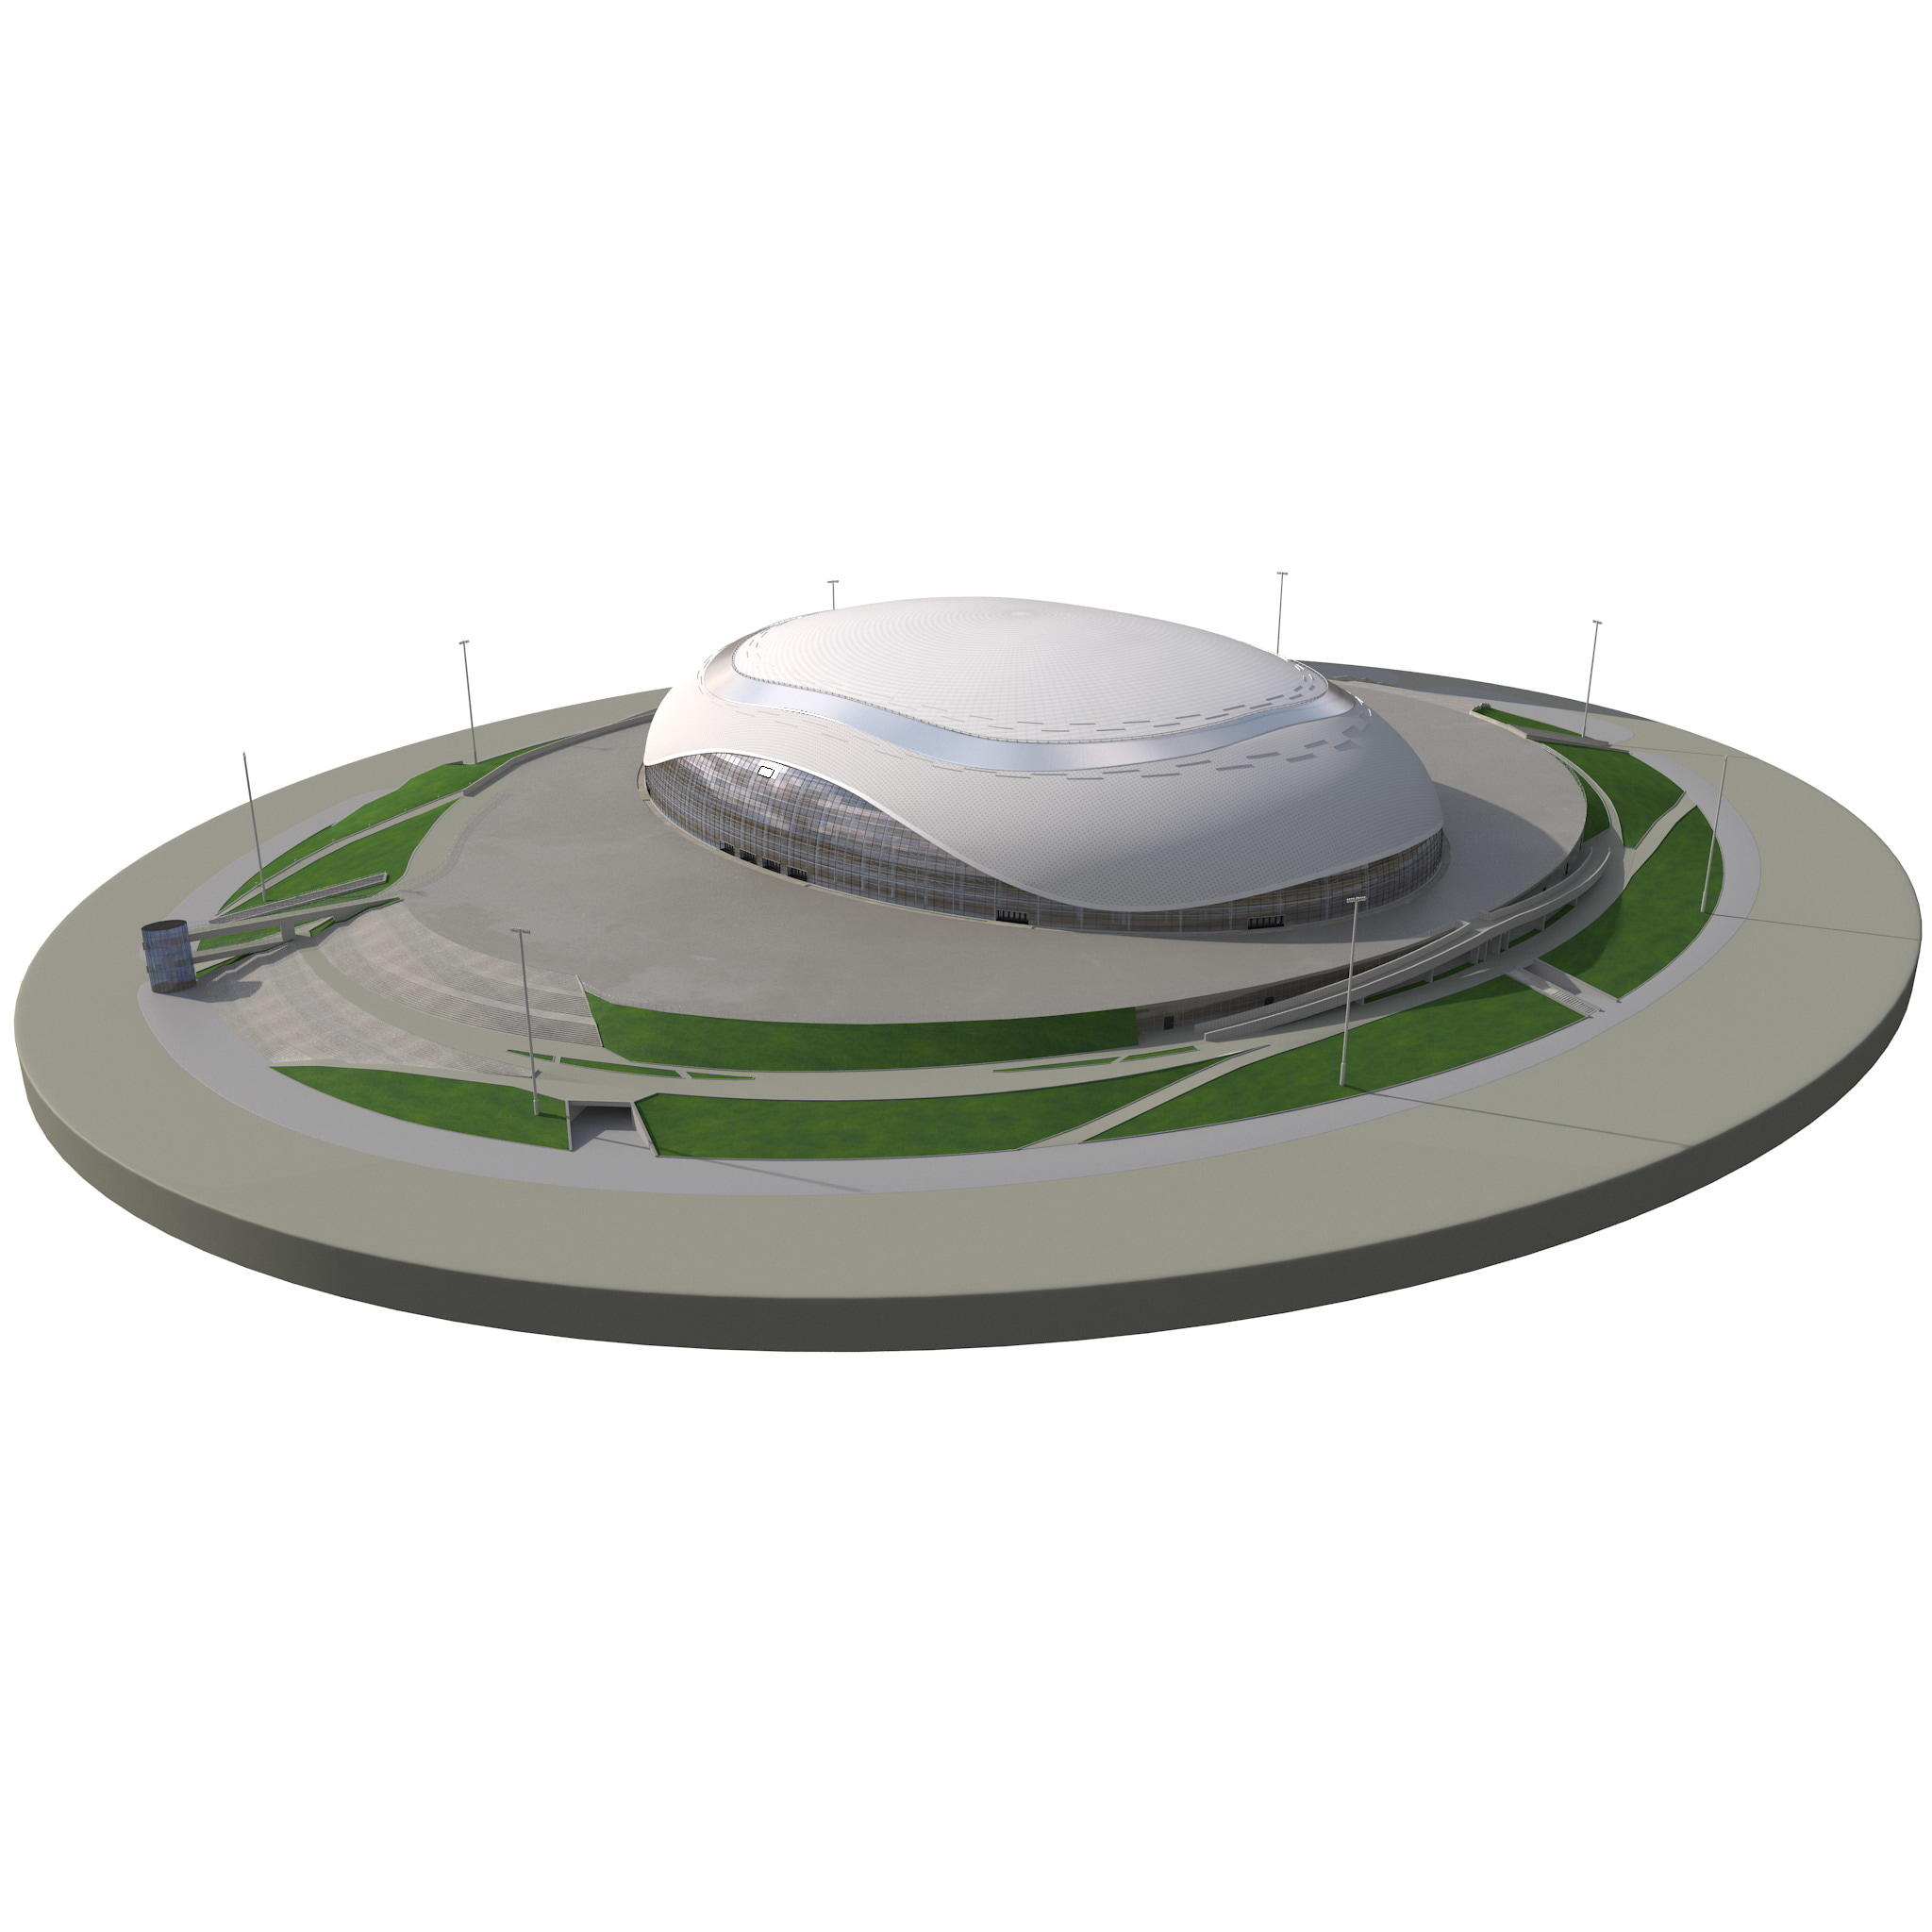 Bolshoy Ice Dome Sochi_2.jpg